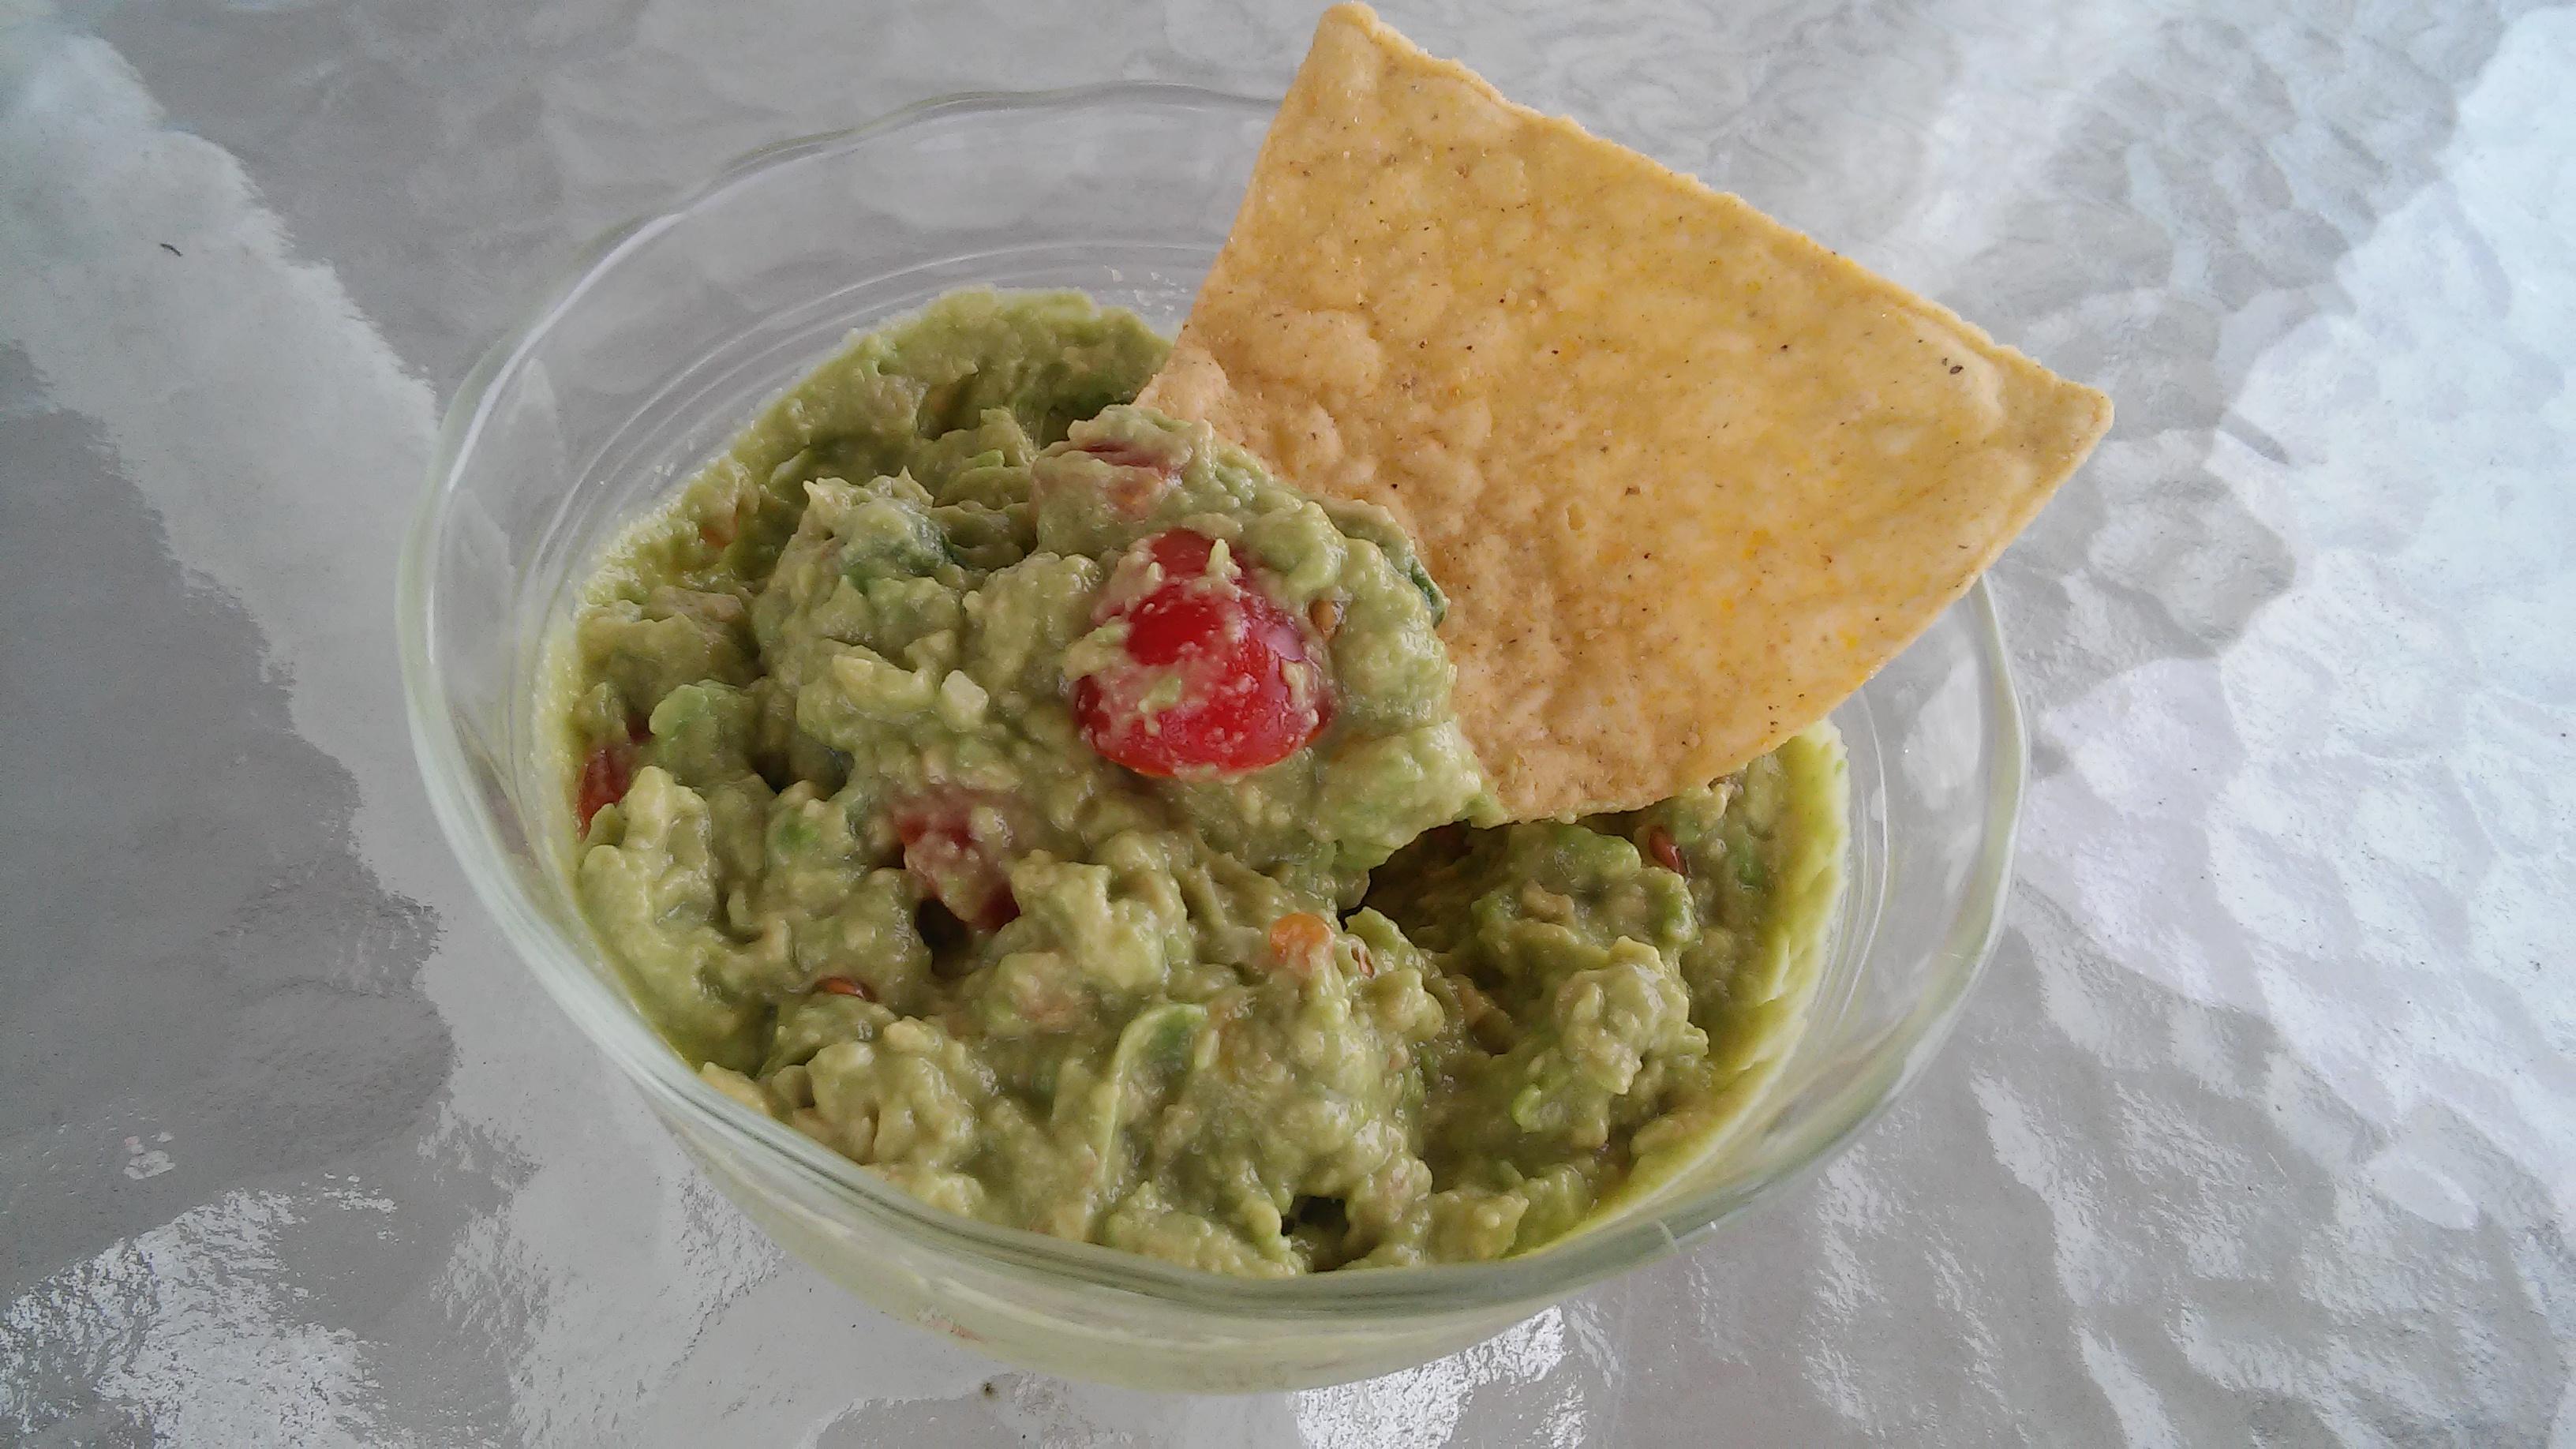 Basic Guacamole Dip